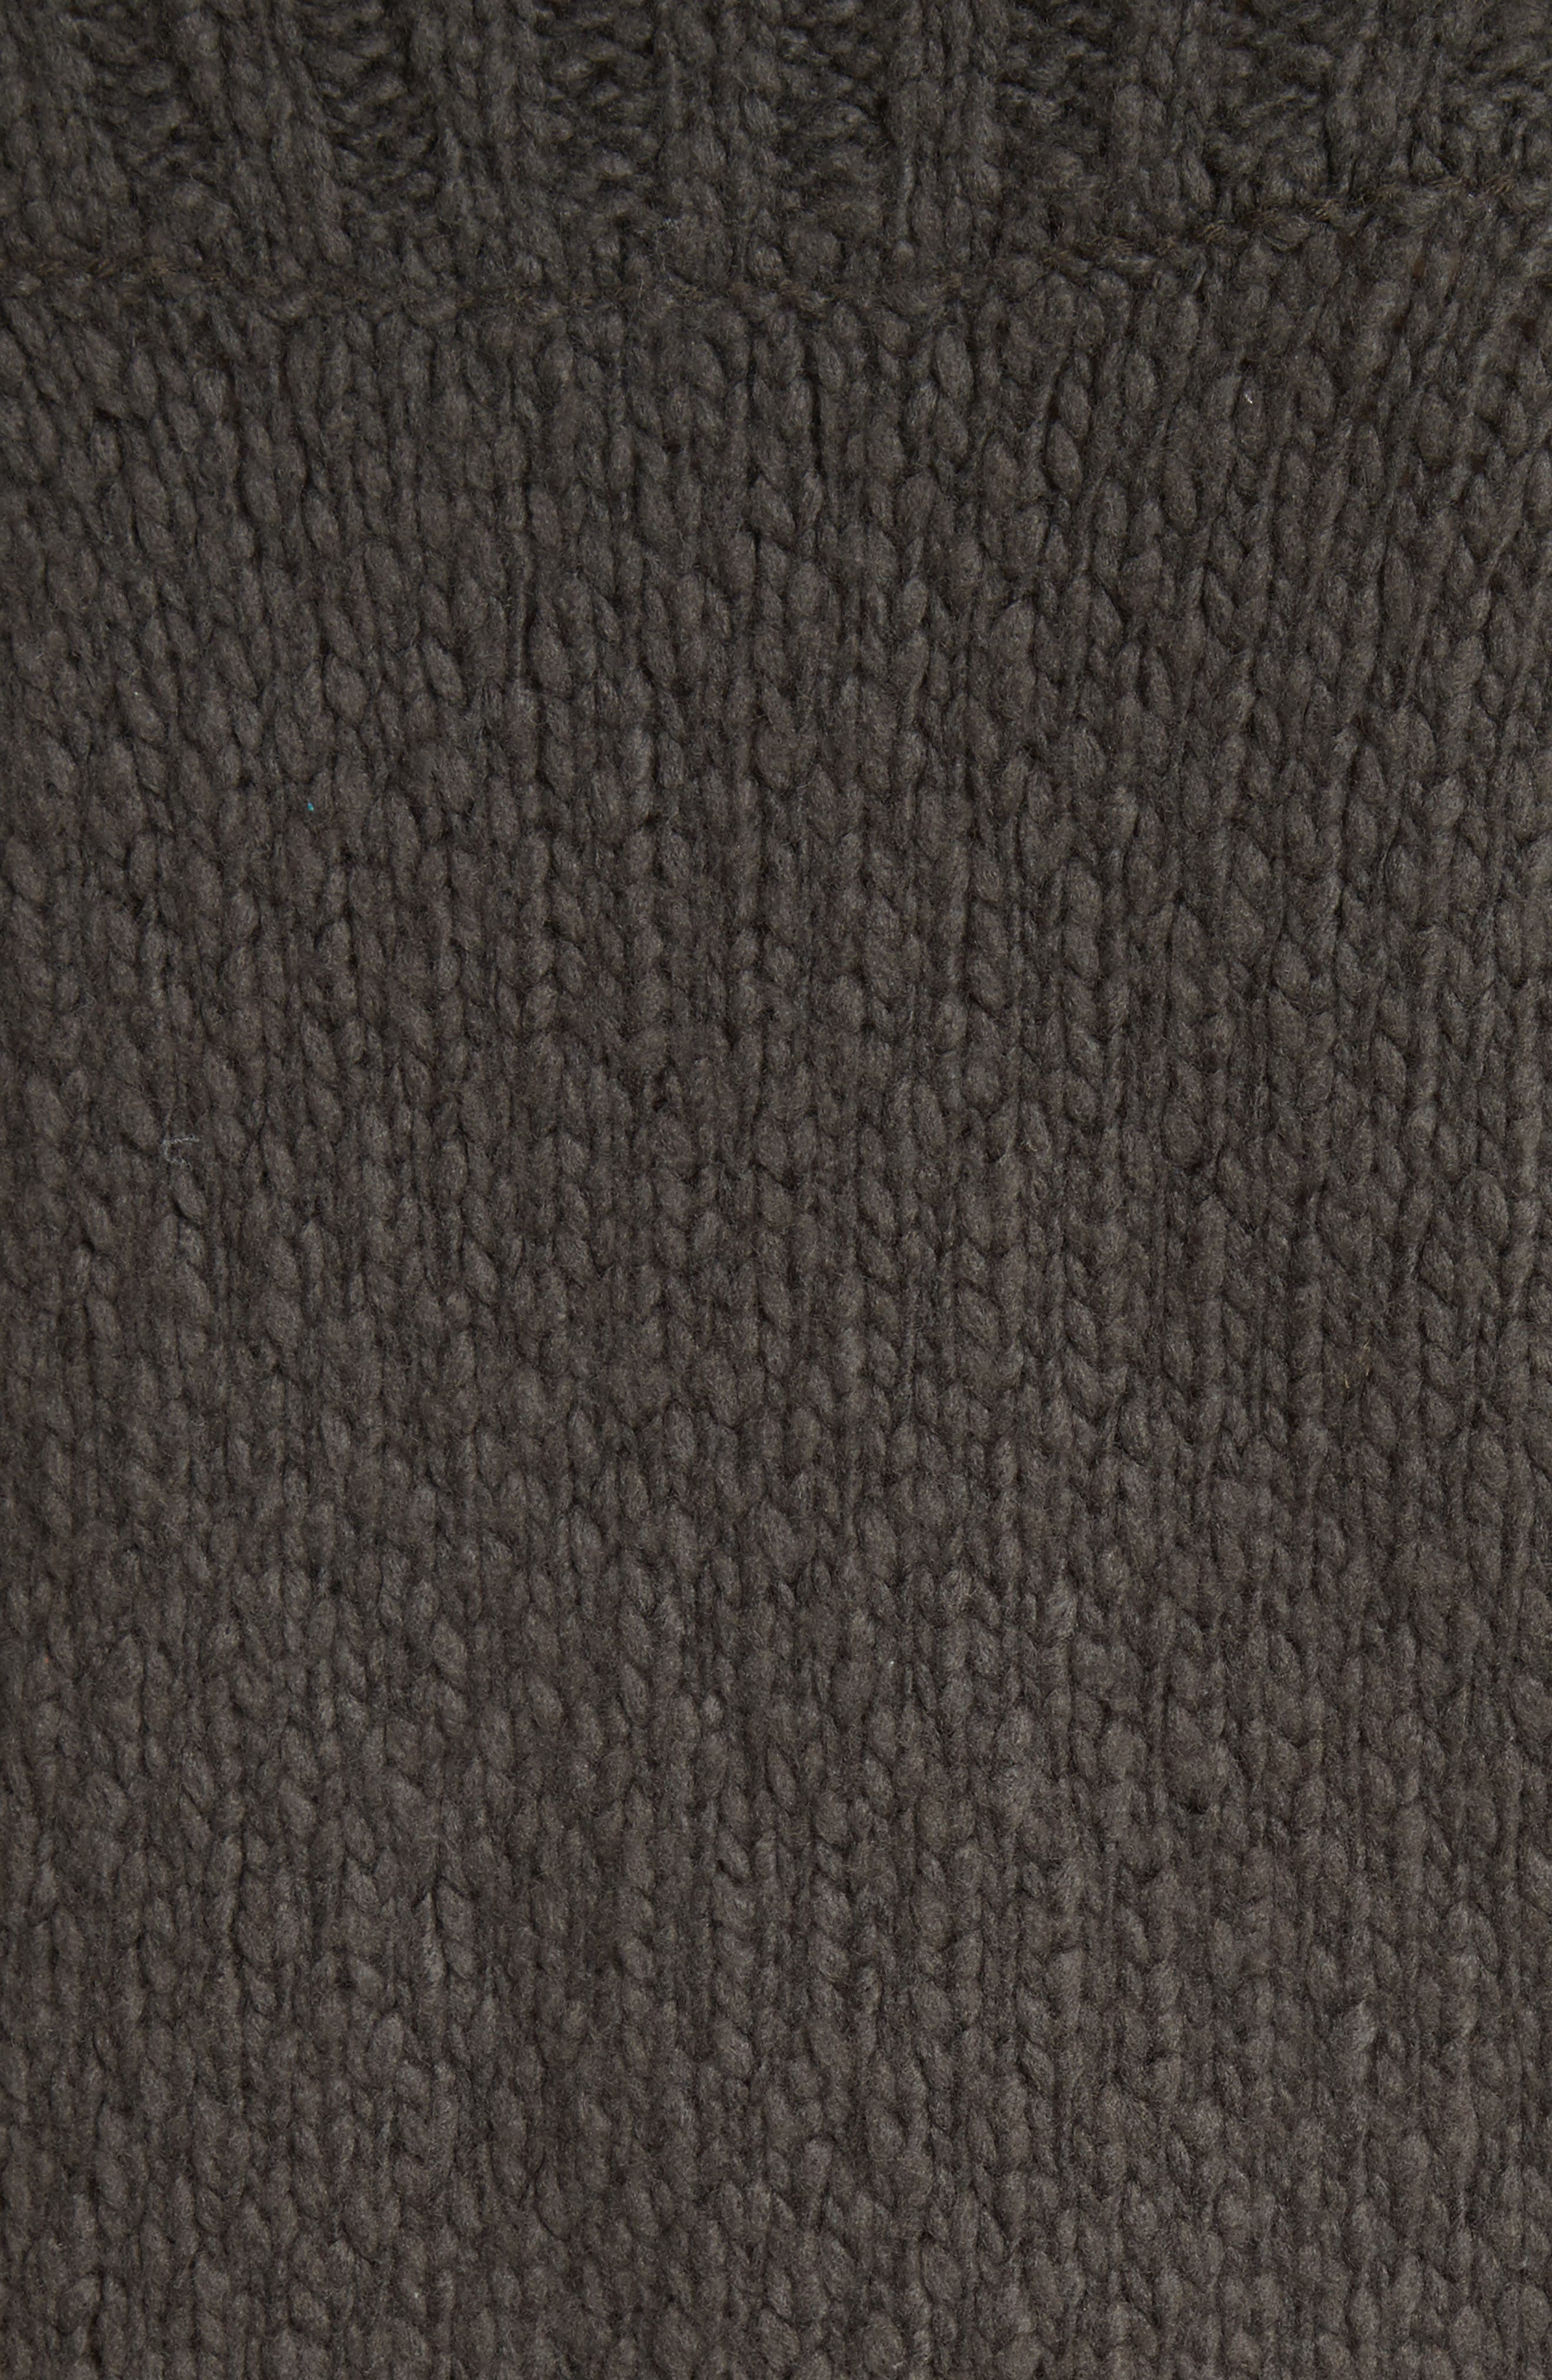 Ribbed Yoke Knit Sweater,                             Alternate thumbnail 5, color,                             082